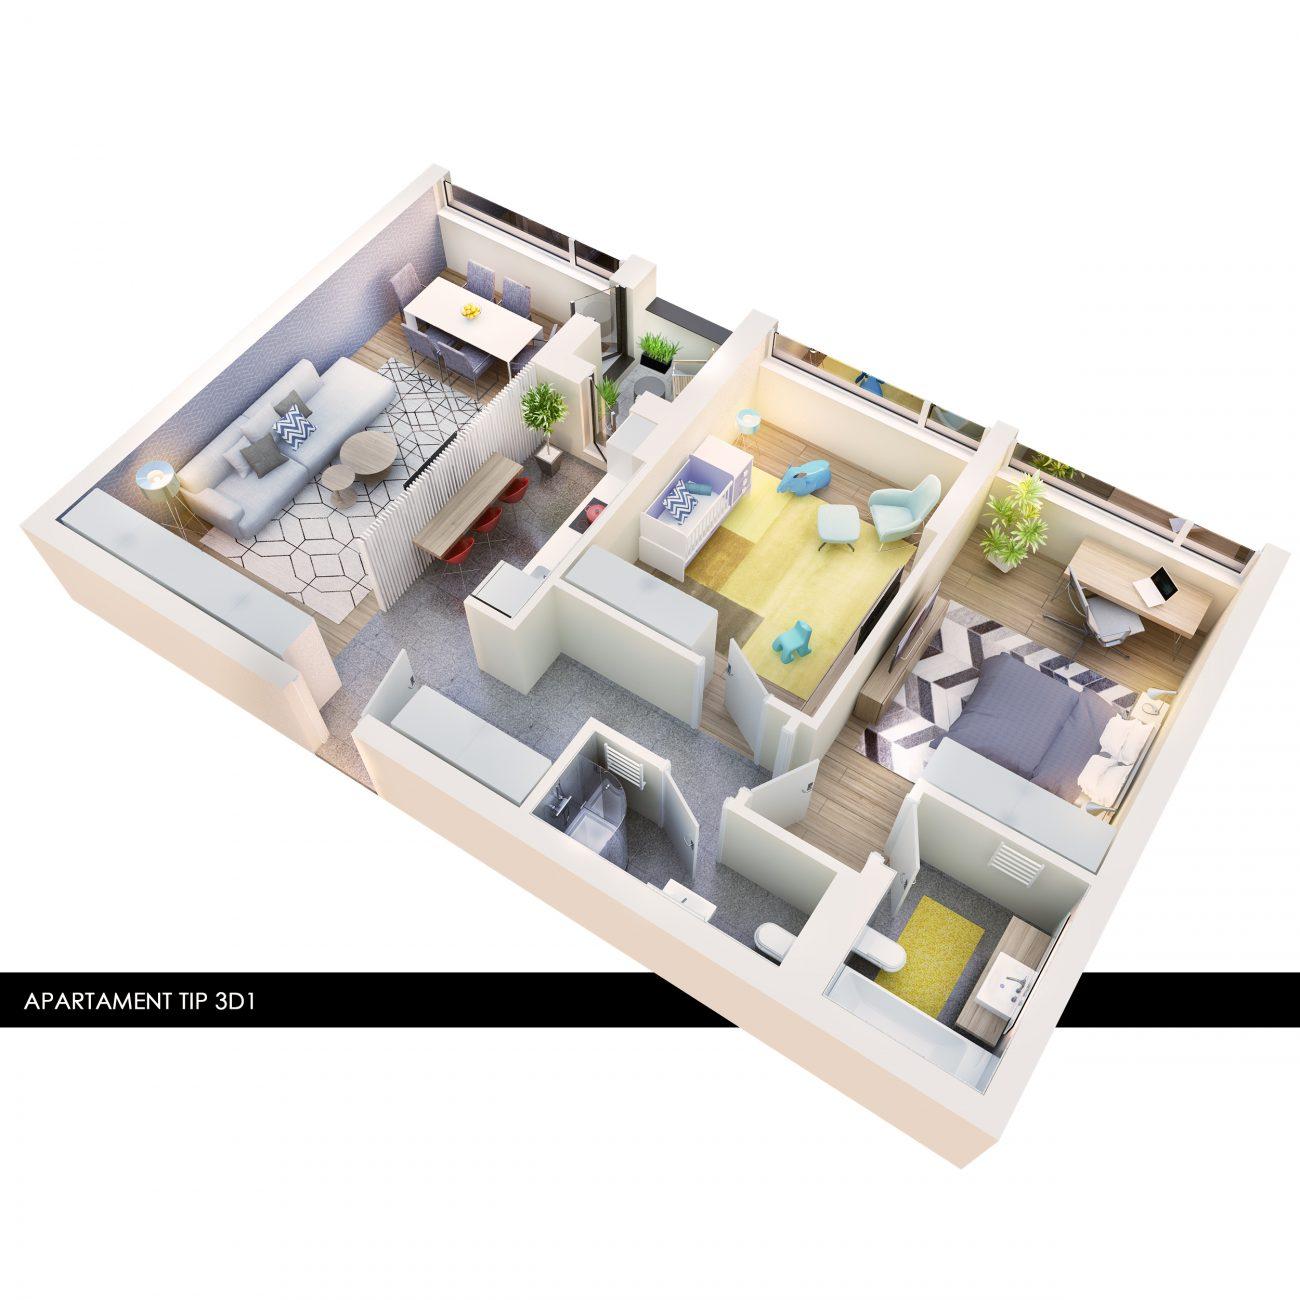 Atria Urban Resort amenajare 3 camere model 3D1